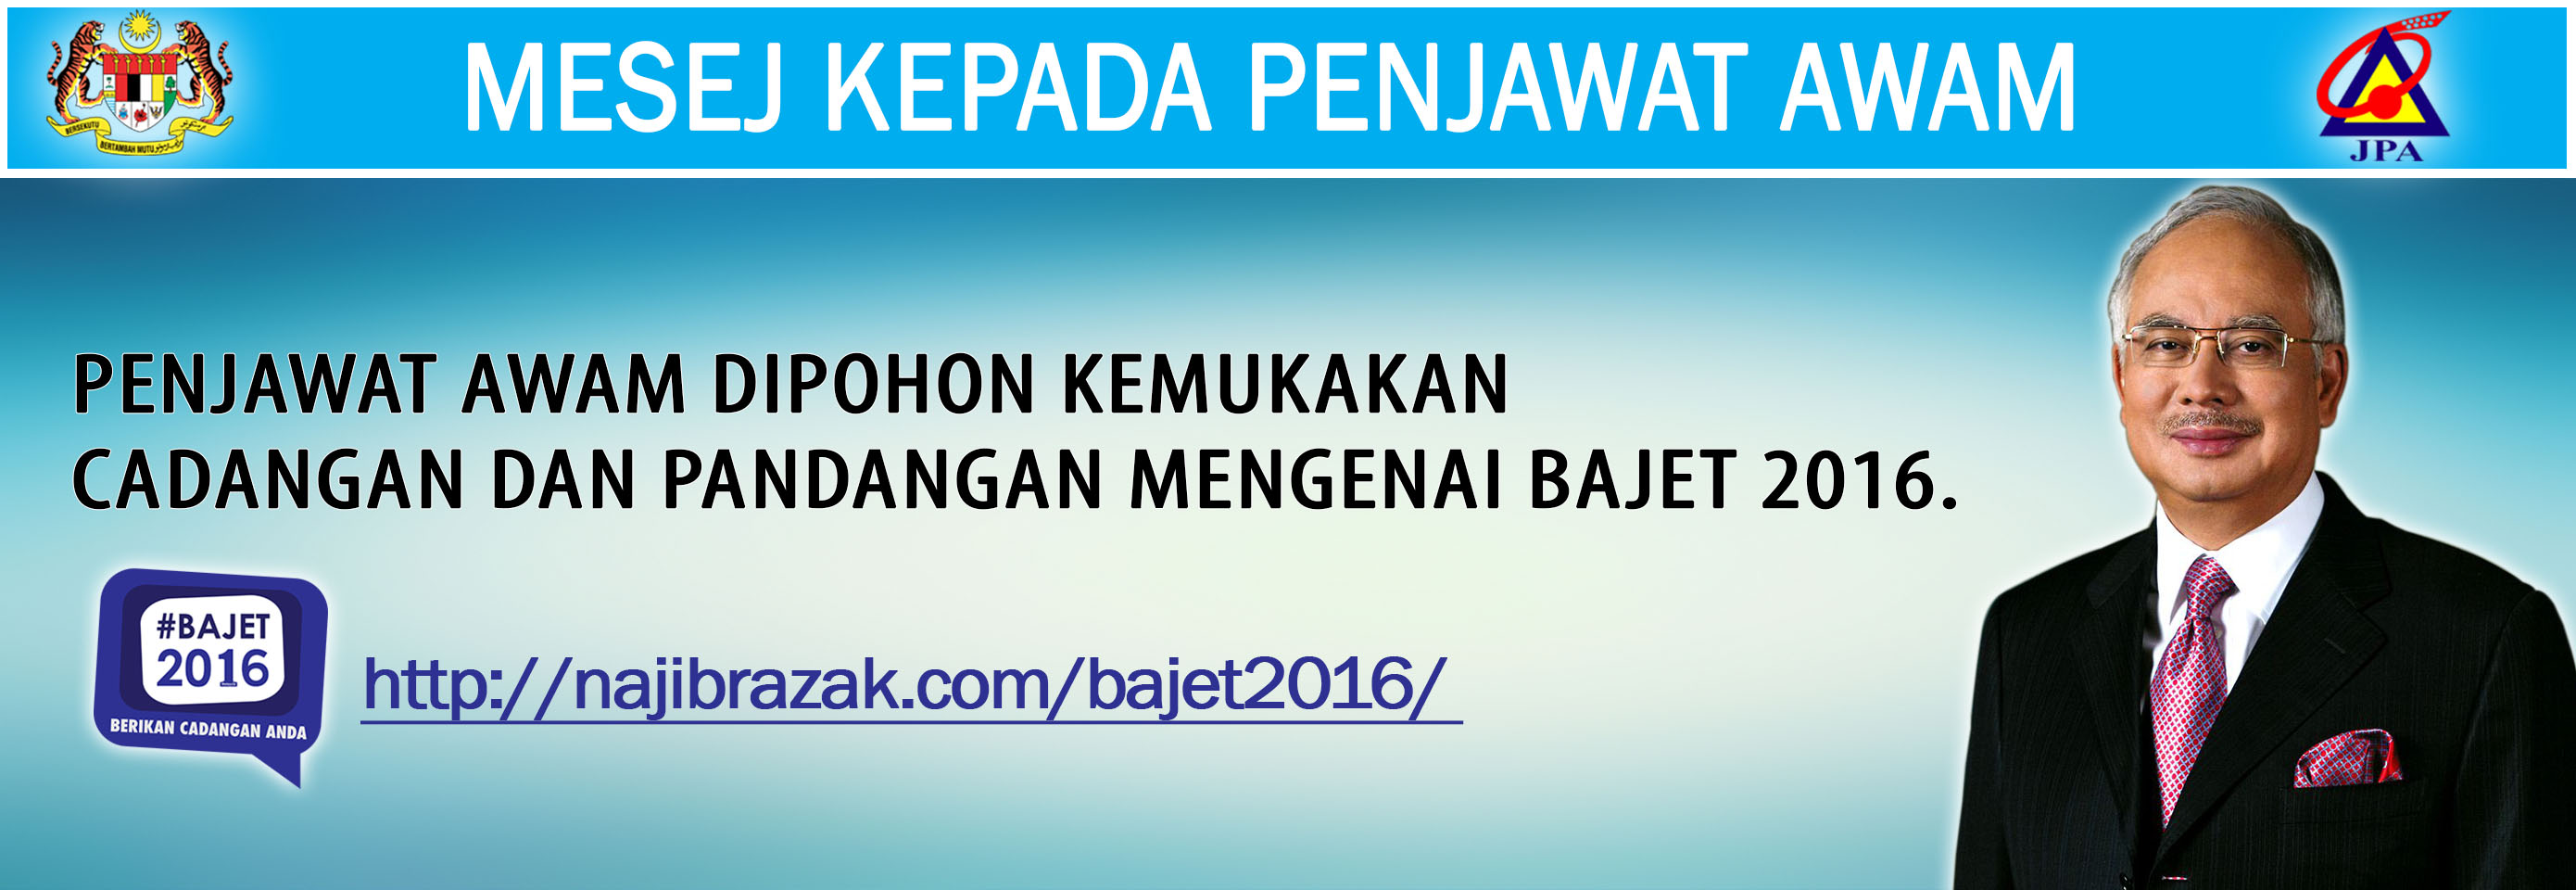 MESEJ: Penjawat awam dipohon untuk mengemukakan cadangan dan pandangan mengenai Bajet 2016